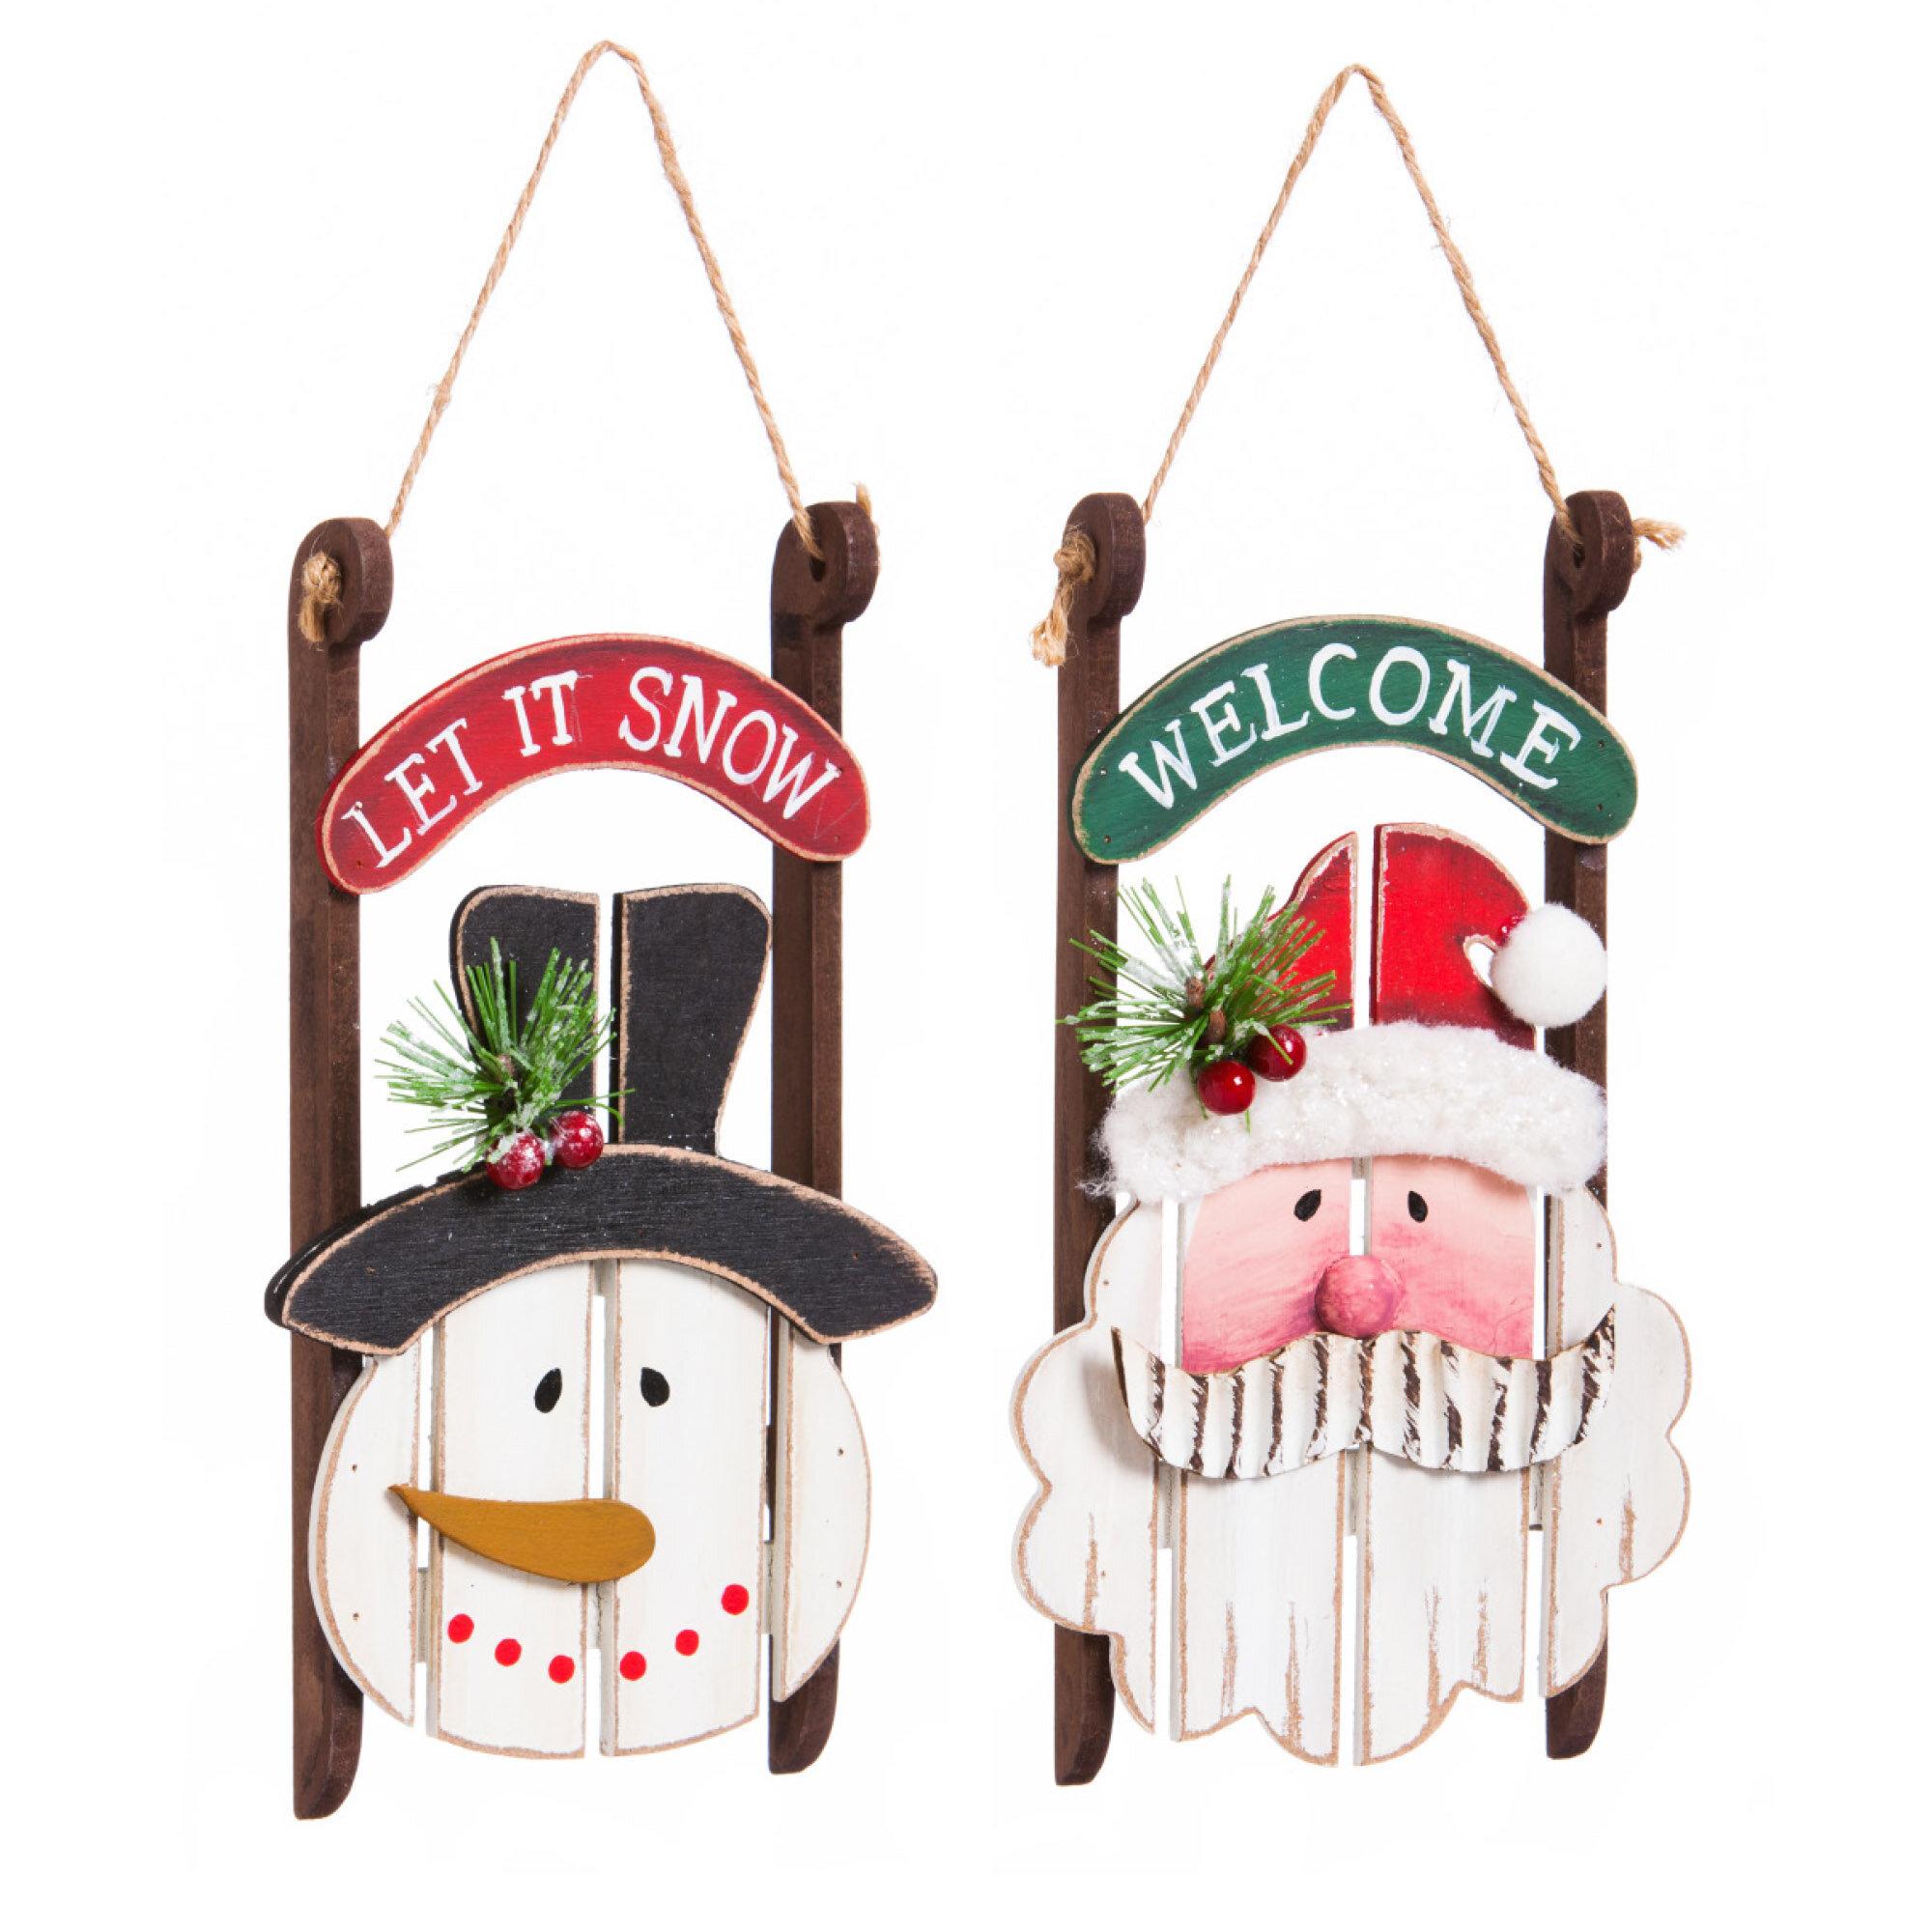 the holiday aisle 2 piece wooden santasnowman sled hanging figurine set reviews wayfair - Santa Snowman 2